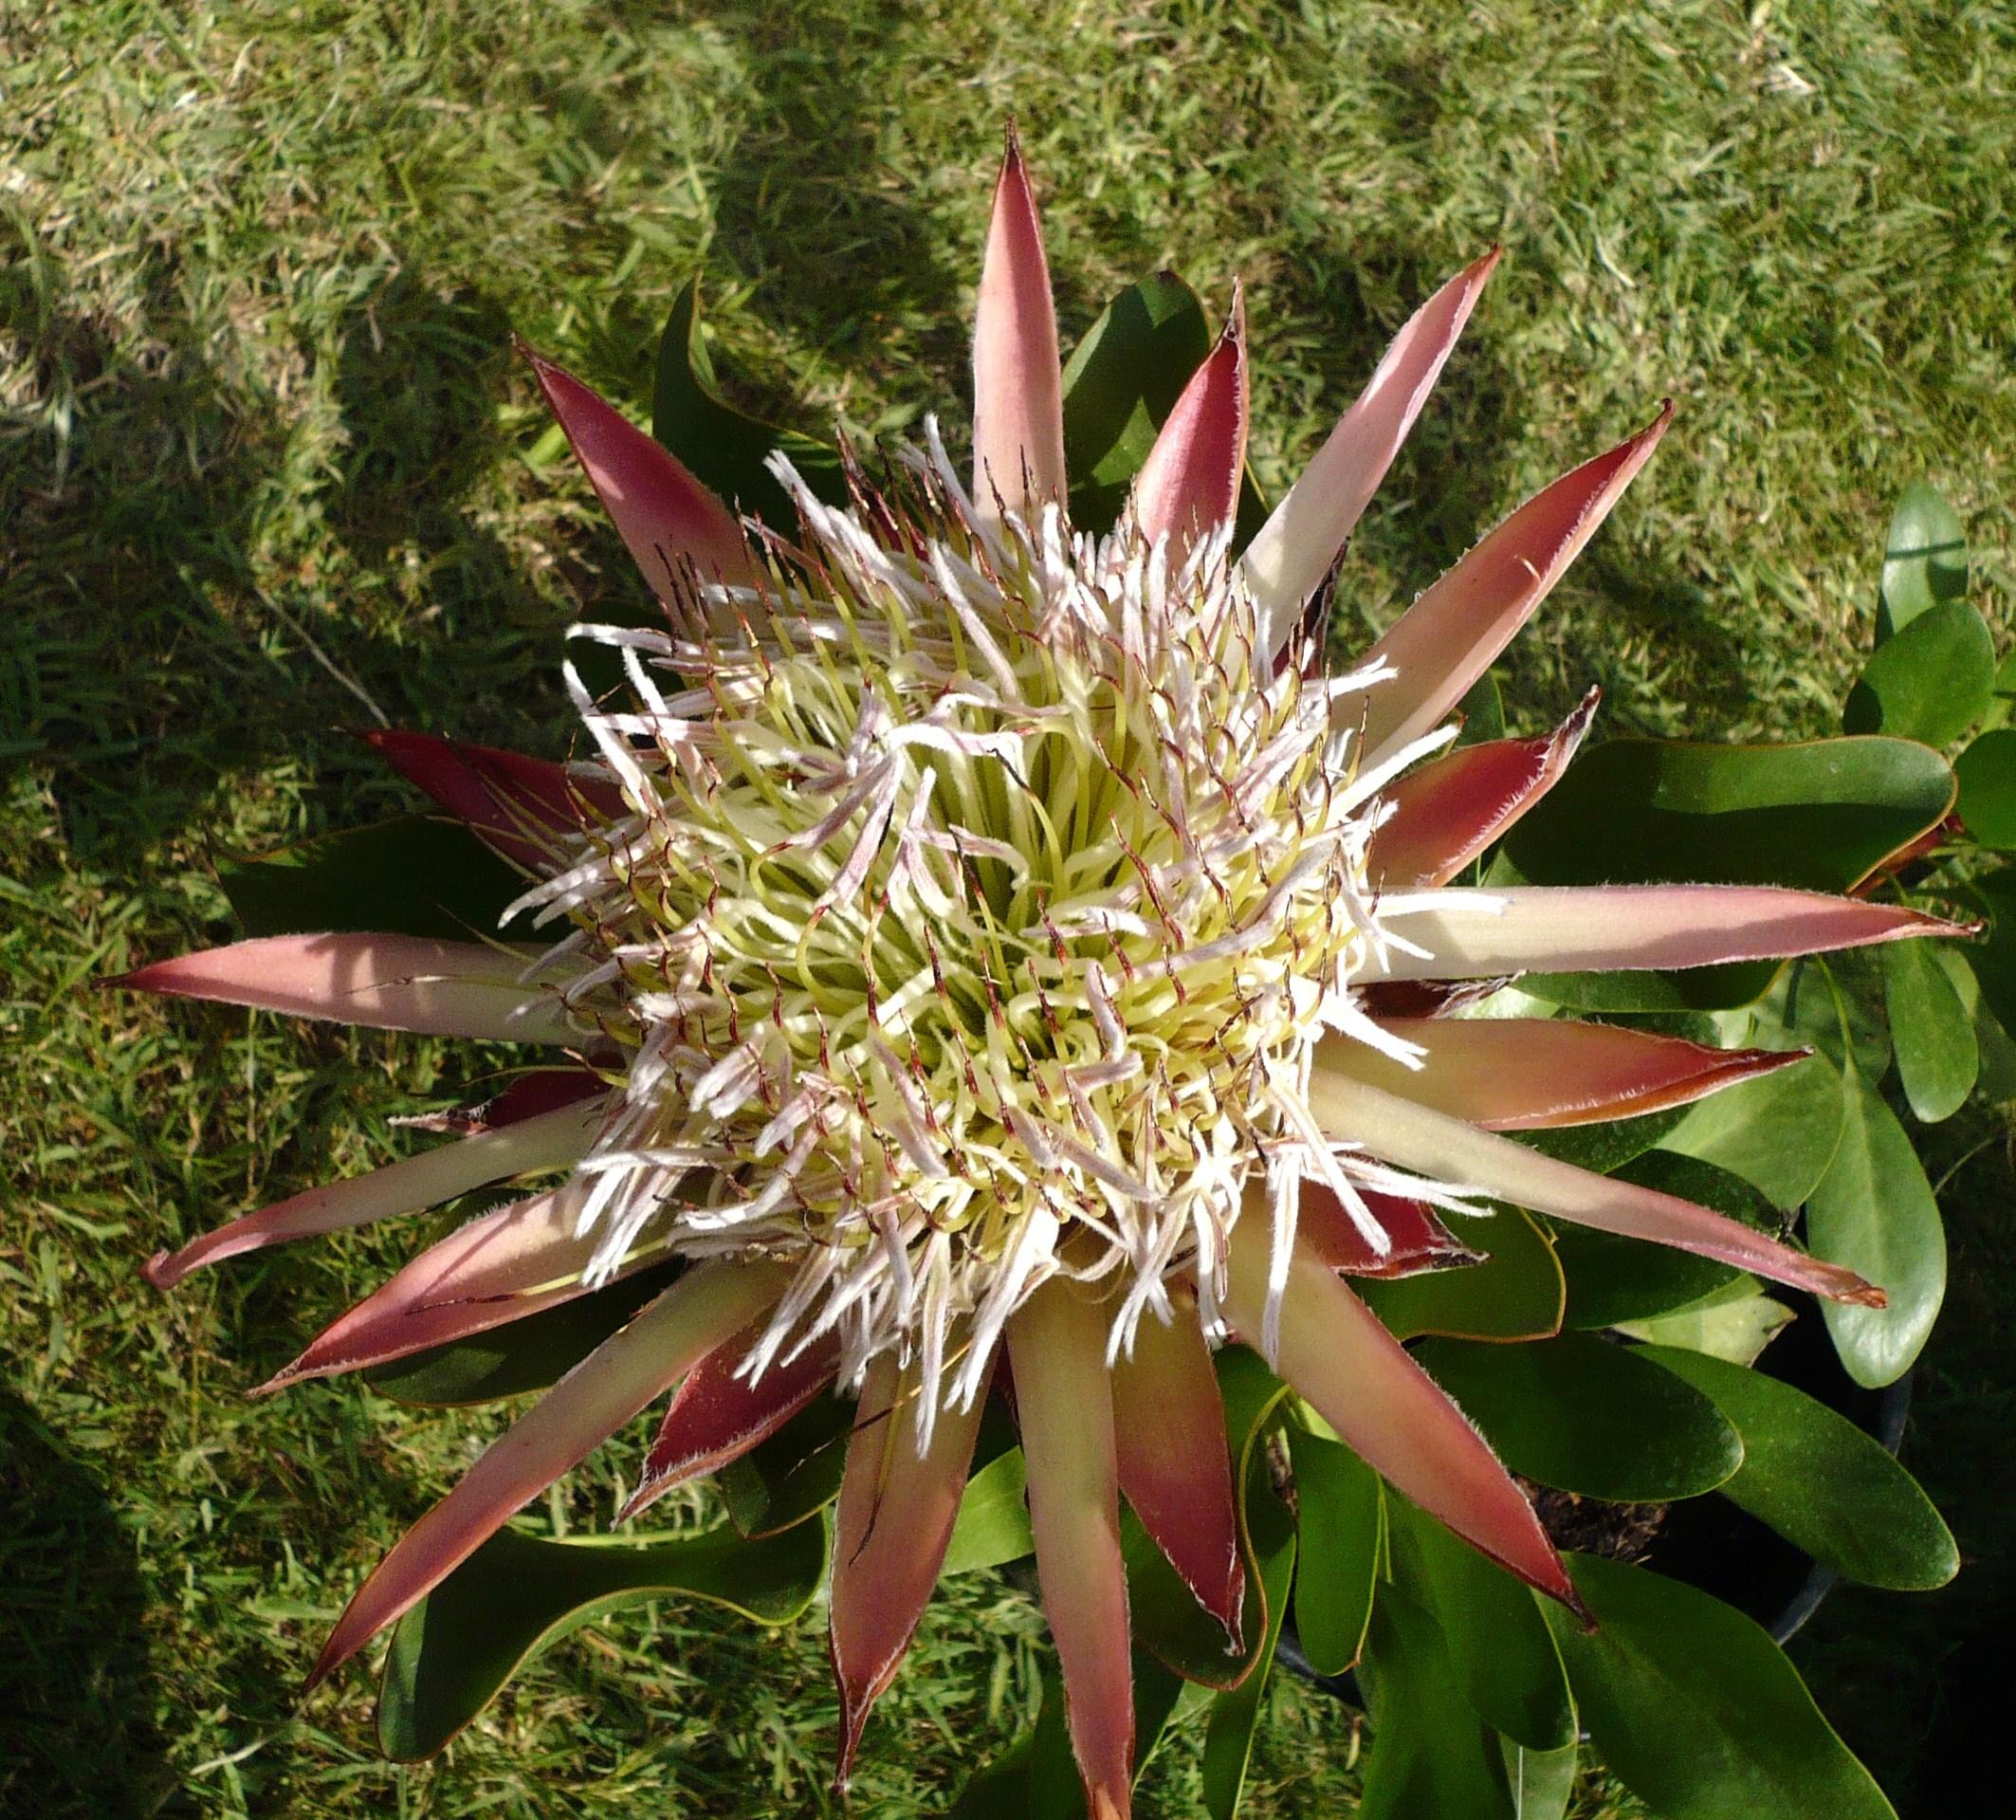 le-jardin-dalbertas-et-ses-splendeurs-028.JPG